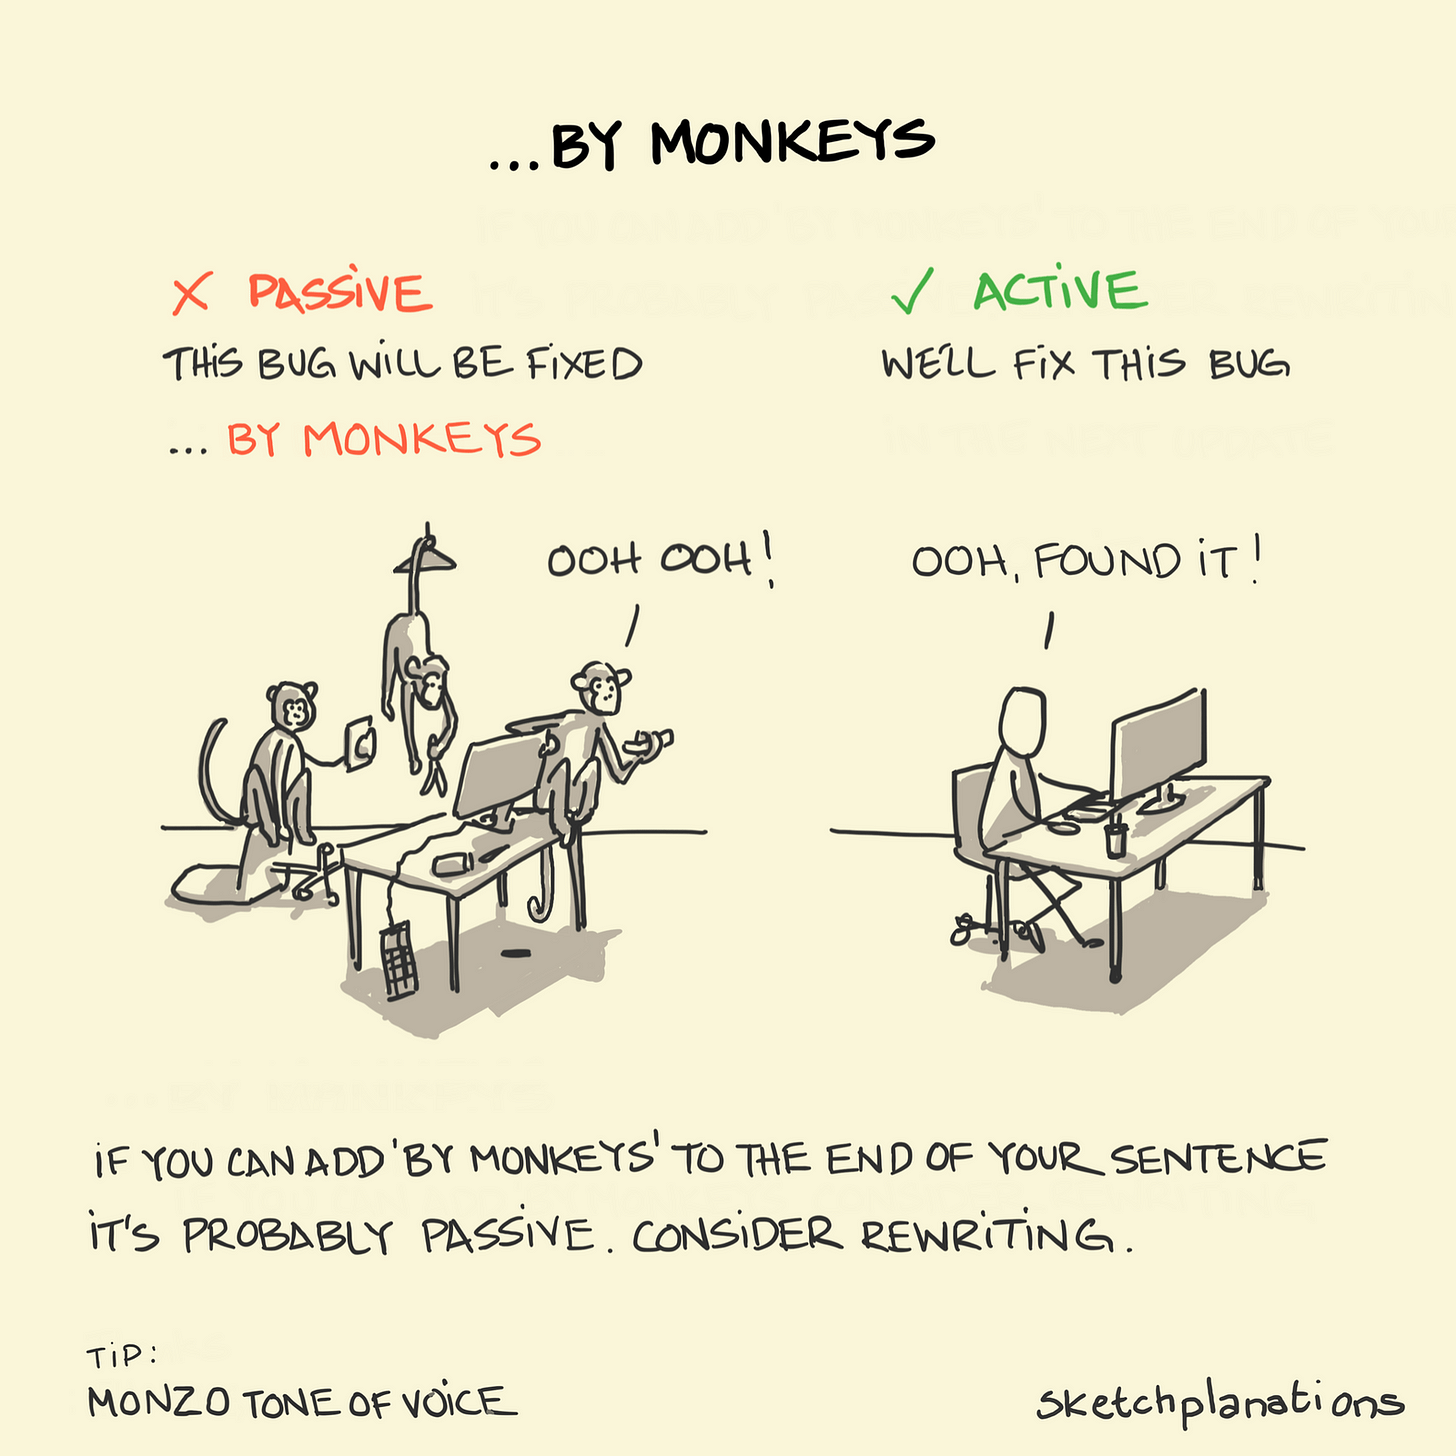 By monkeys - Sketchplanations